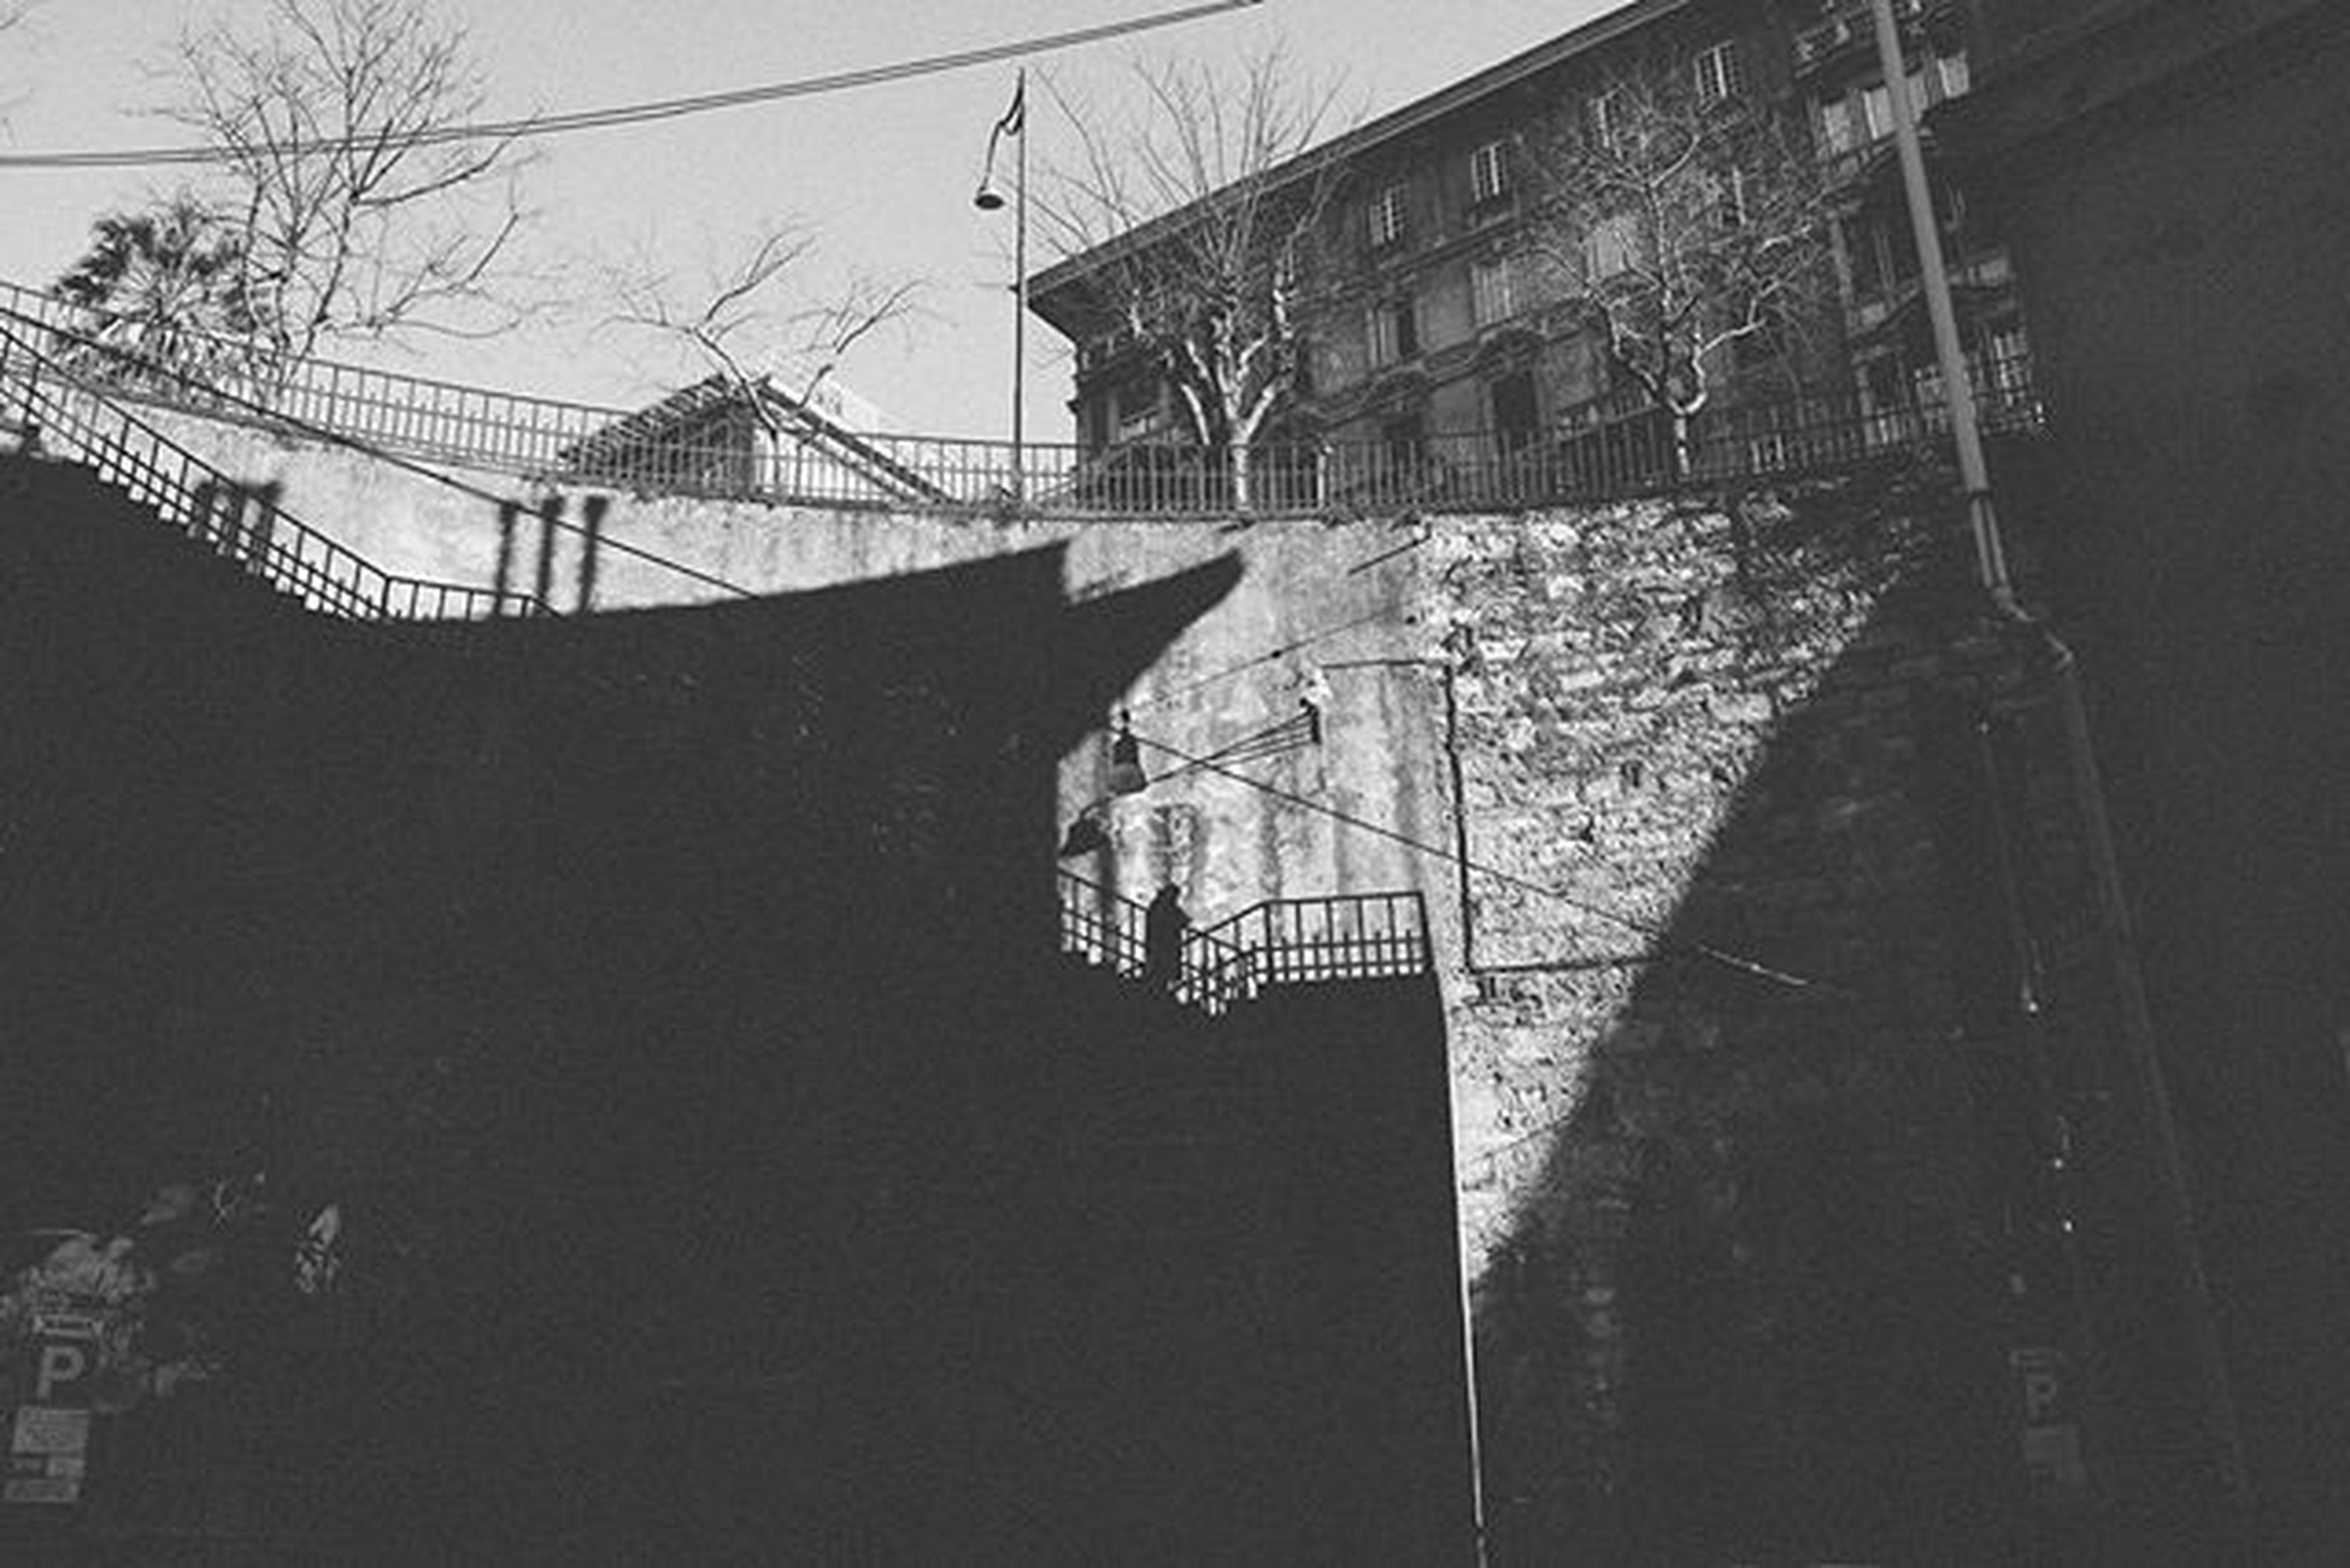 Genova - January 2016 3/6 Genova Igersgenova Ig_italy Street Streetphotography Everydayeverywhere ExploreEverything Minimal Minimalism Urbanpeople Urbanstrangers Urbanlife Urbanphotography Vscofilm VSCO Guardiancities Huffpostgram Cntraveler Myfeaturesshoot Minimalpeople Streetdreamsmag Streetphotographers Exploreeverthing Streetlife Shadowhunters silhouette_creative streetphoto_bw blackandwhitephotography bw_photooftheday